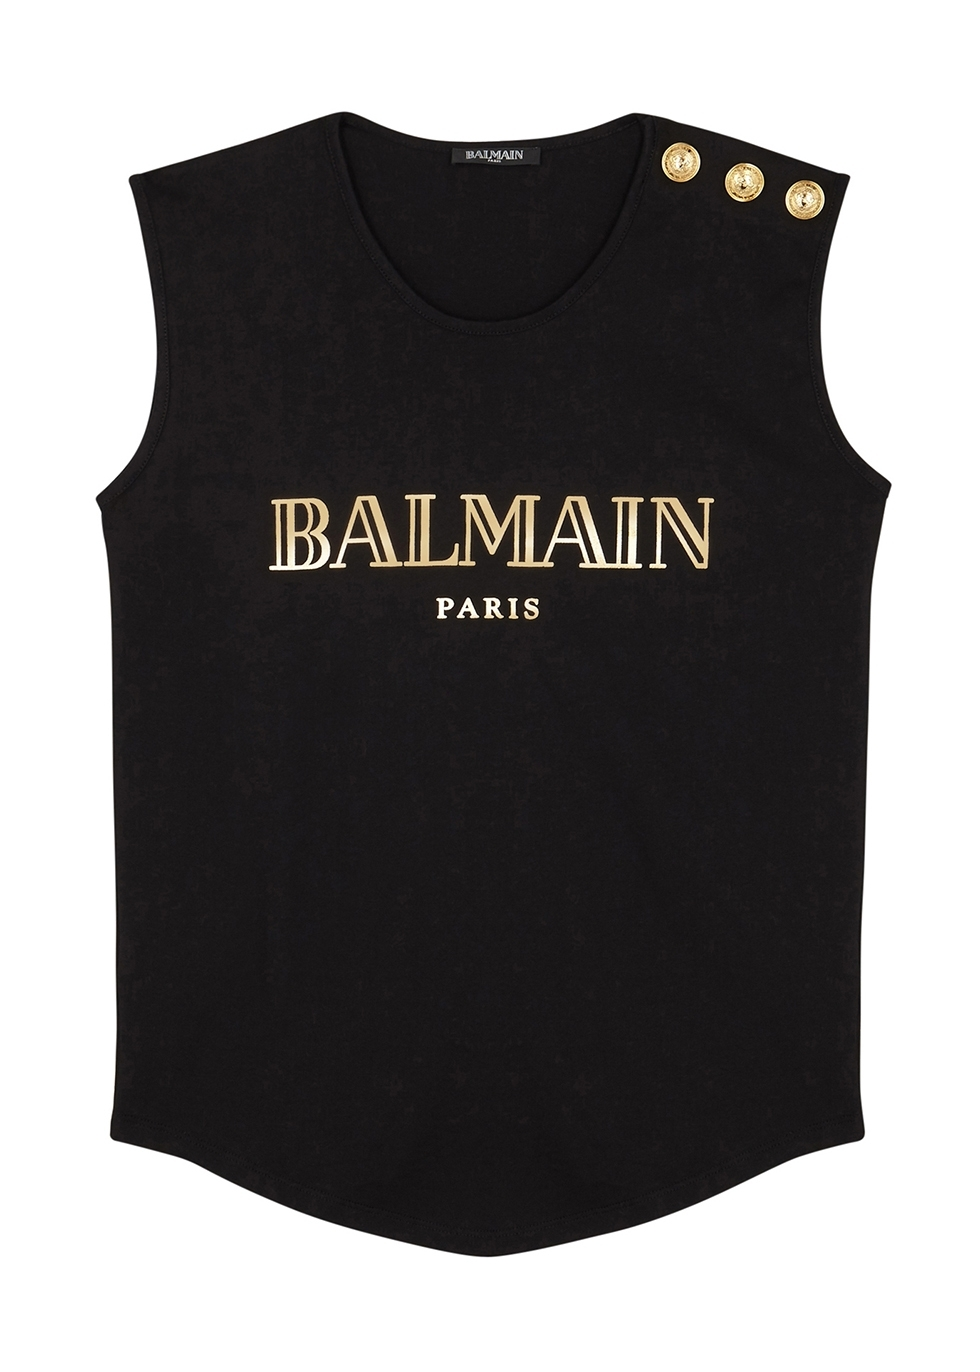 754f6ddc Balmain - Designer Jeans, Perfume & T-Shirts - Harvey Nichols